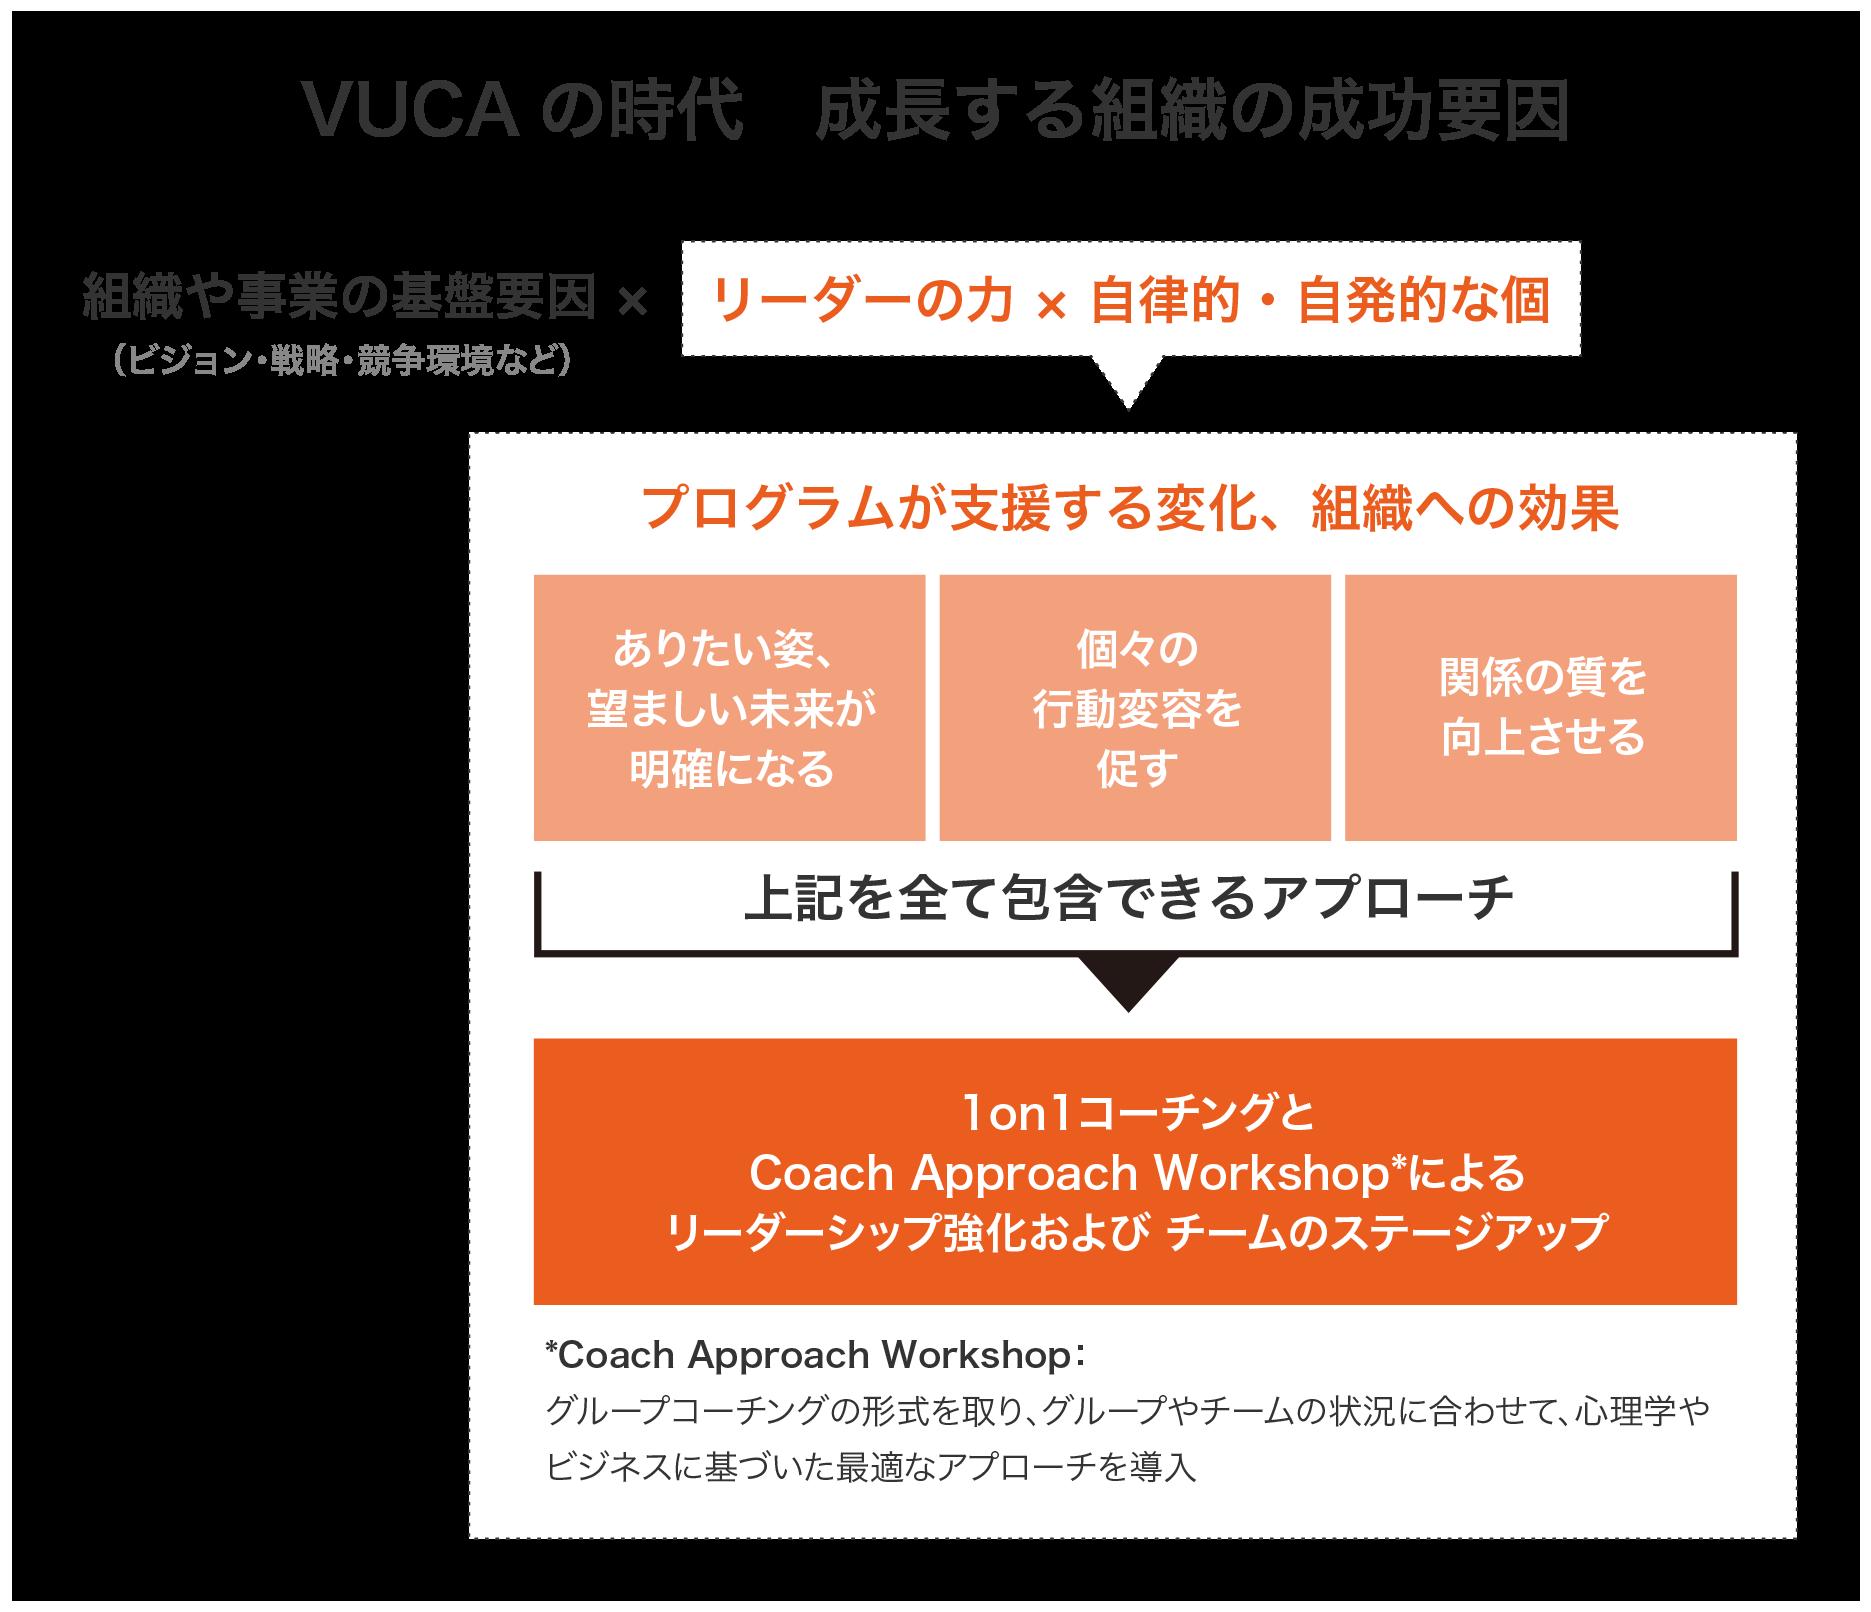 【TCA】一般社団法人 東京コーチング協会